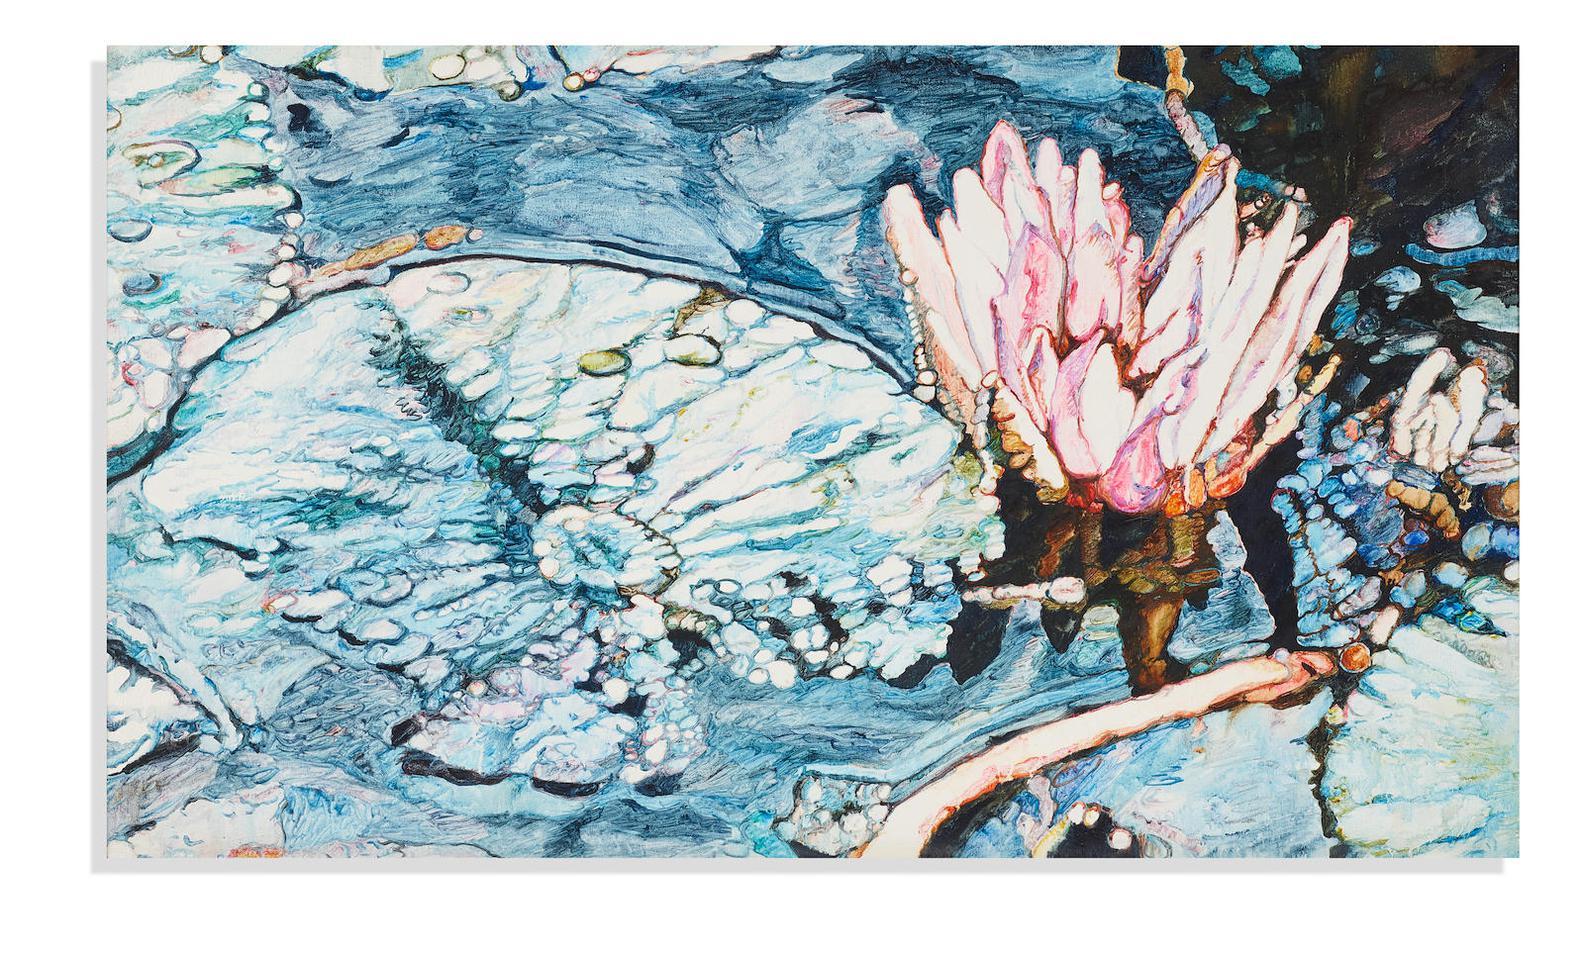 Joseph Raffael-Untitled (Water Lily)-1975